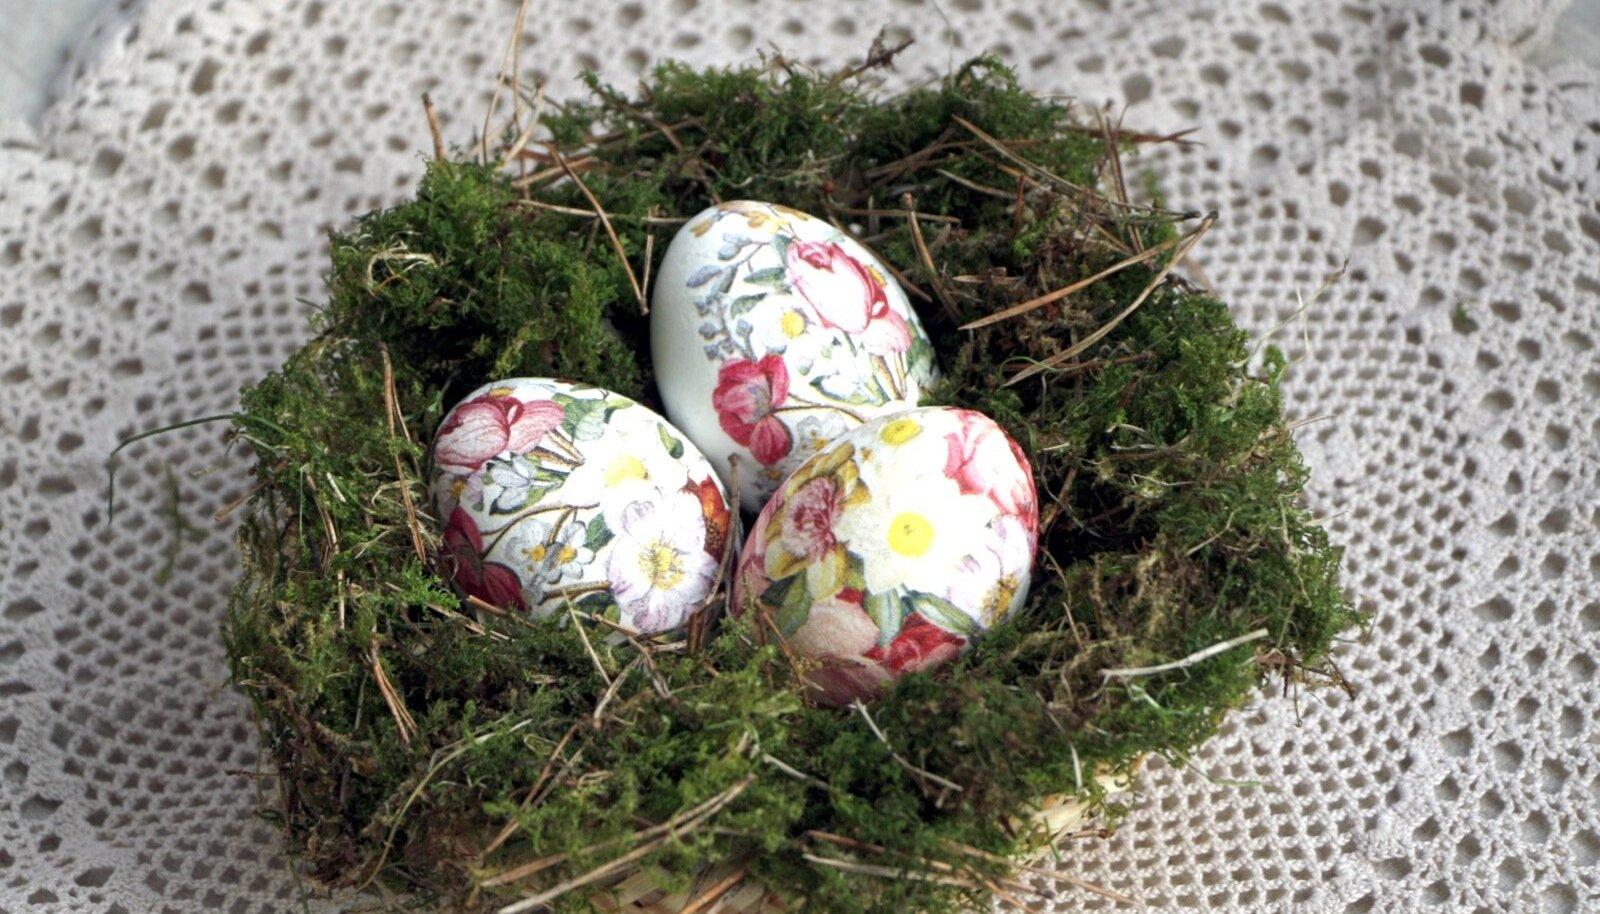 Lillepiltidega munad samblases pesas.